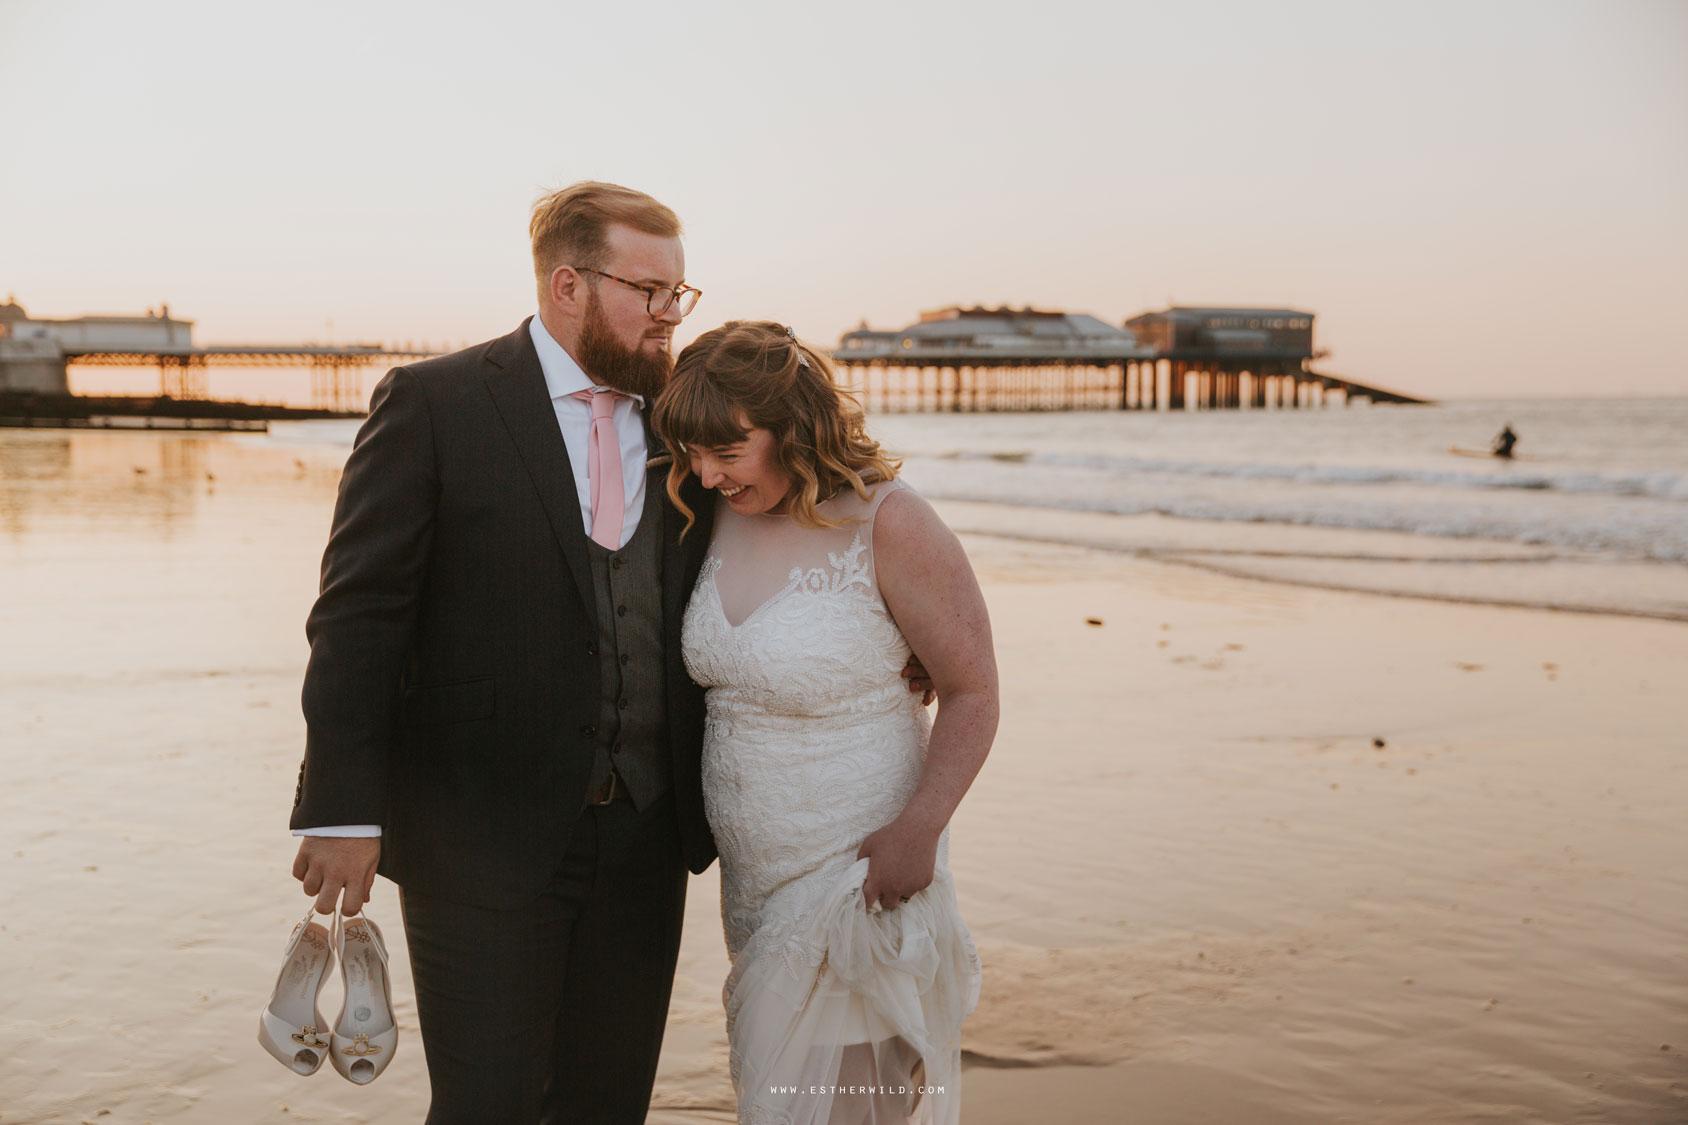 Cromer_Wedding_Beach_Outdoor_Ceremony_Norfolk_North_Lodge_Registry_Office_Rocket_House_Cafe_Cromer_Pier_IMG_5046_IMGL8524.jpg